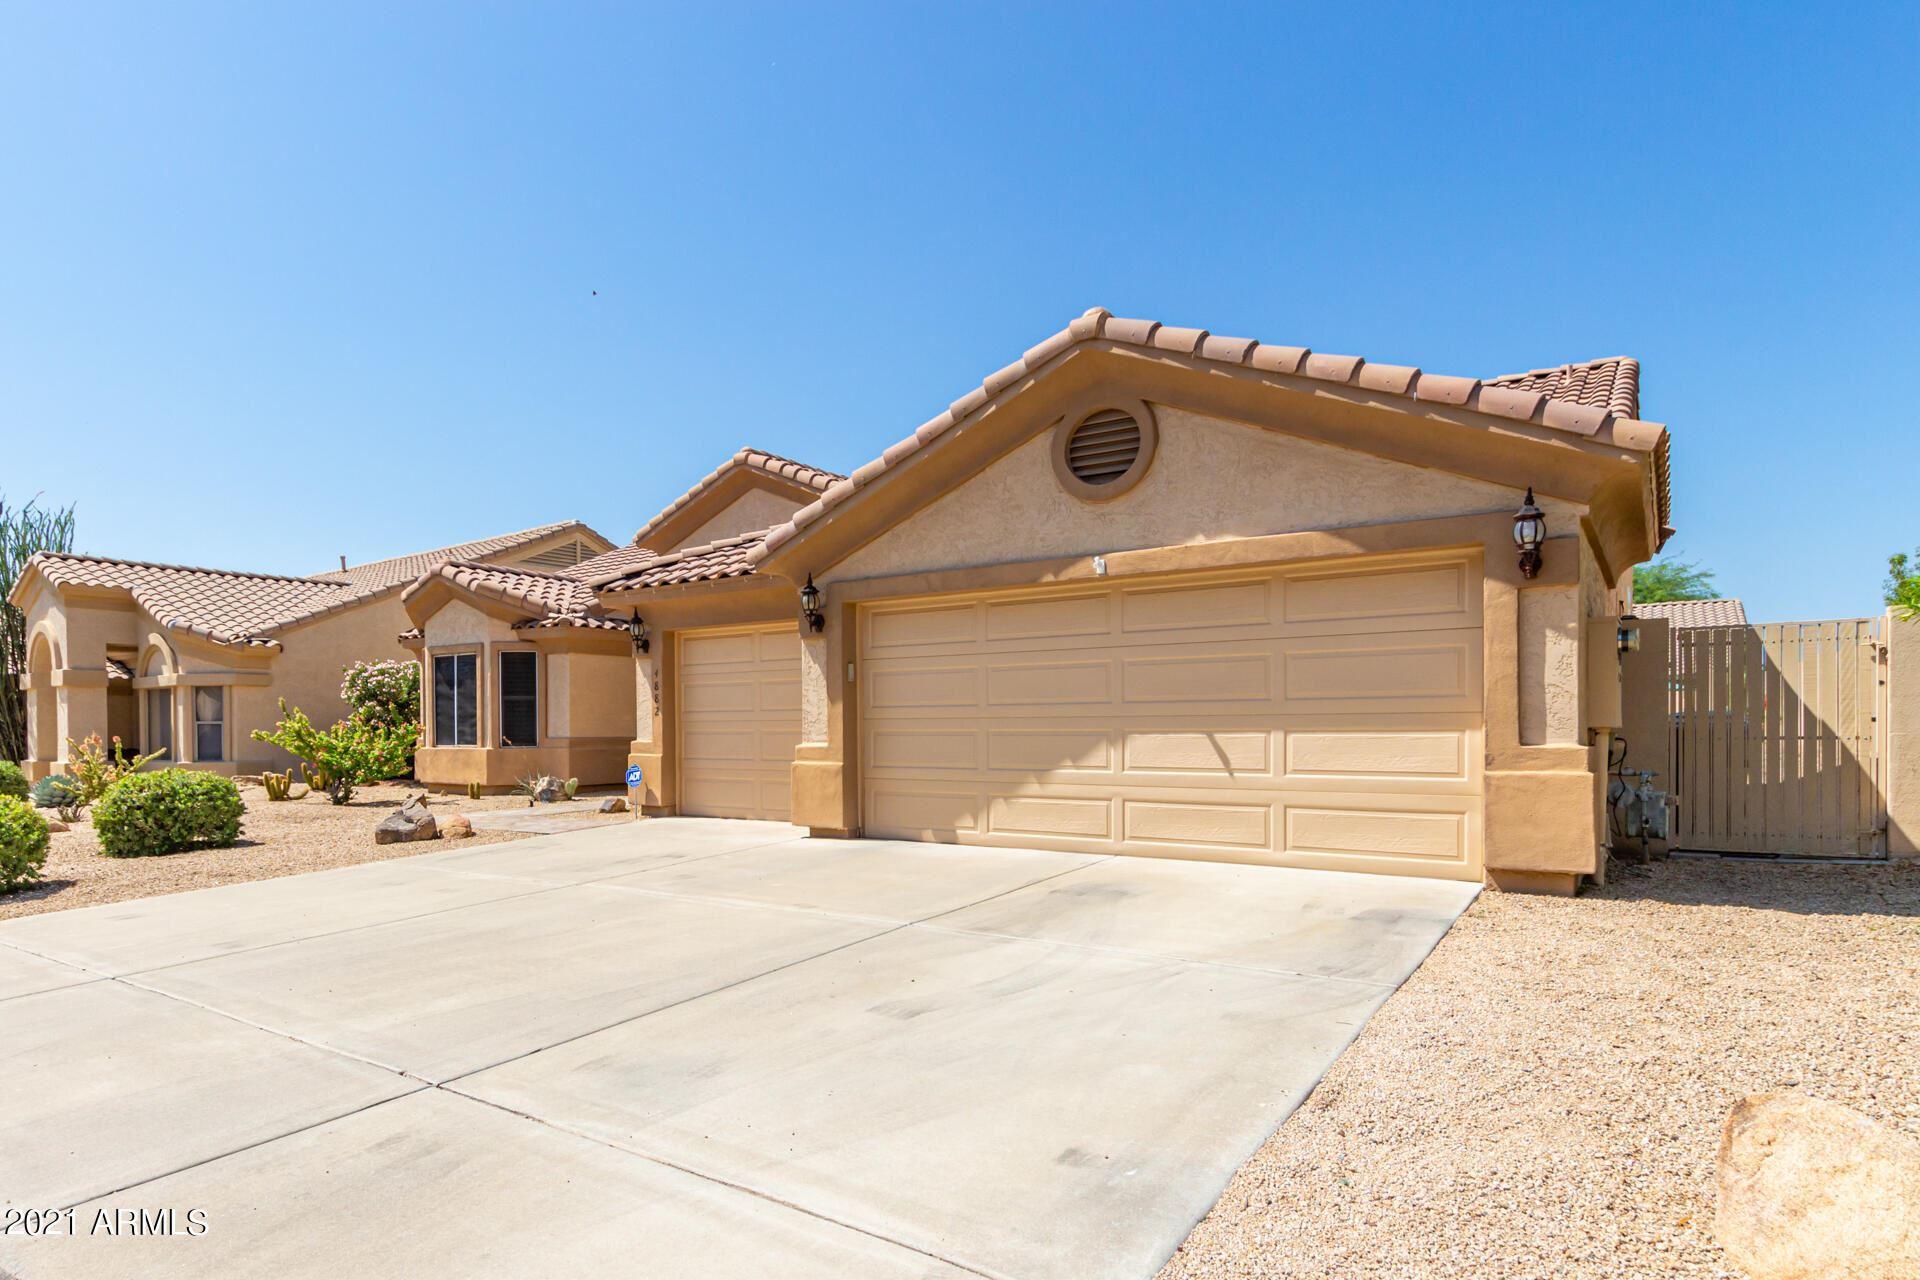 Photo of 4882 E FERNWOOD Court, Cave Creek, AZ 85331 (MLS # 6289878)